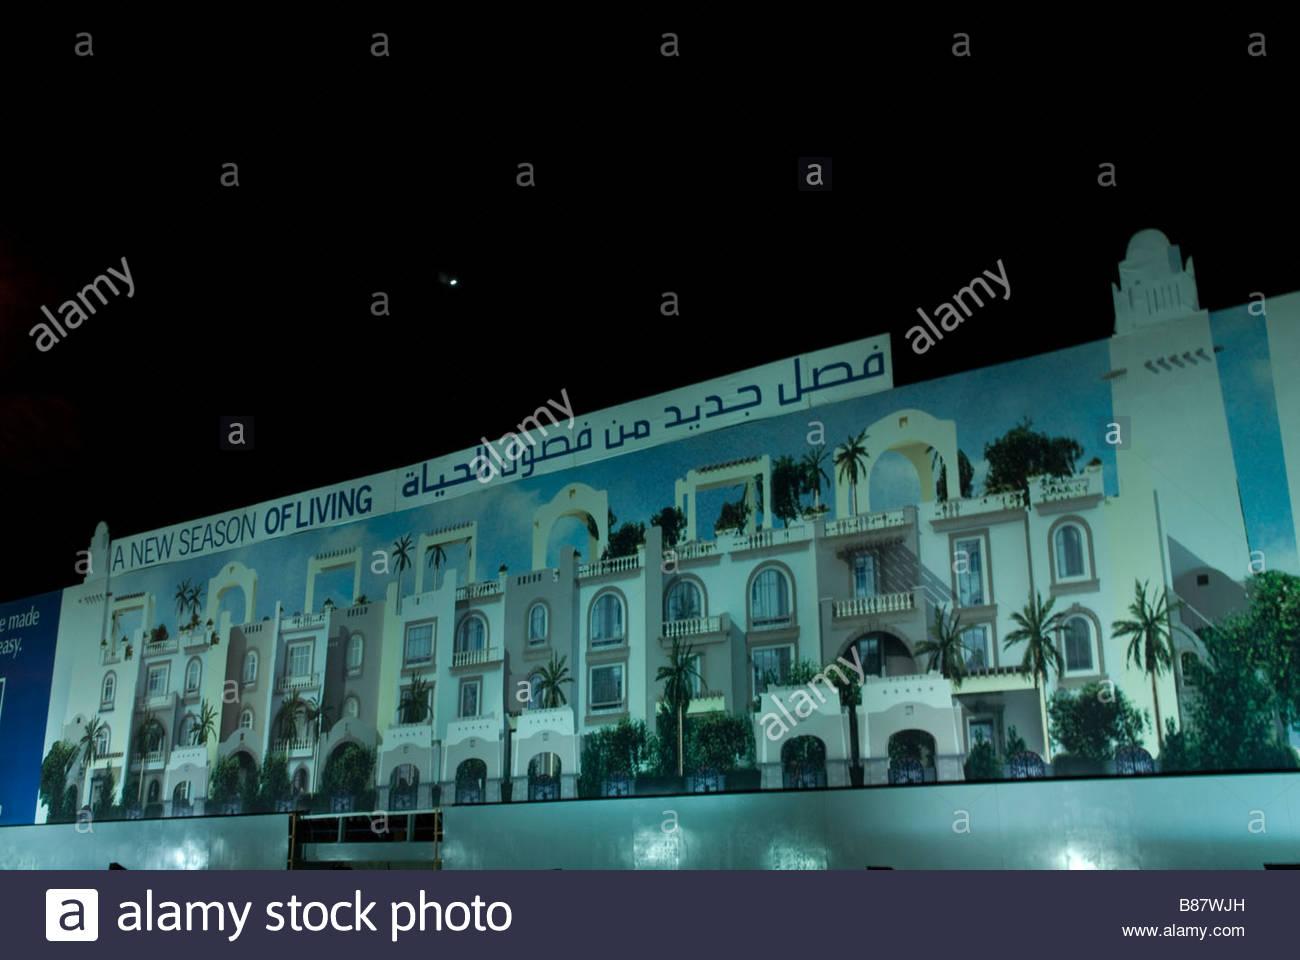 dubai,a gigantic poster of a real estate along shei zaied road - Stock Image